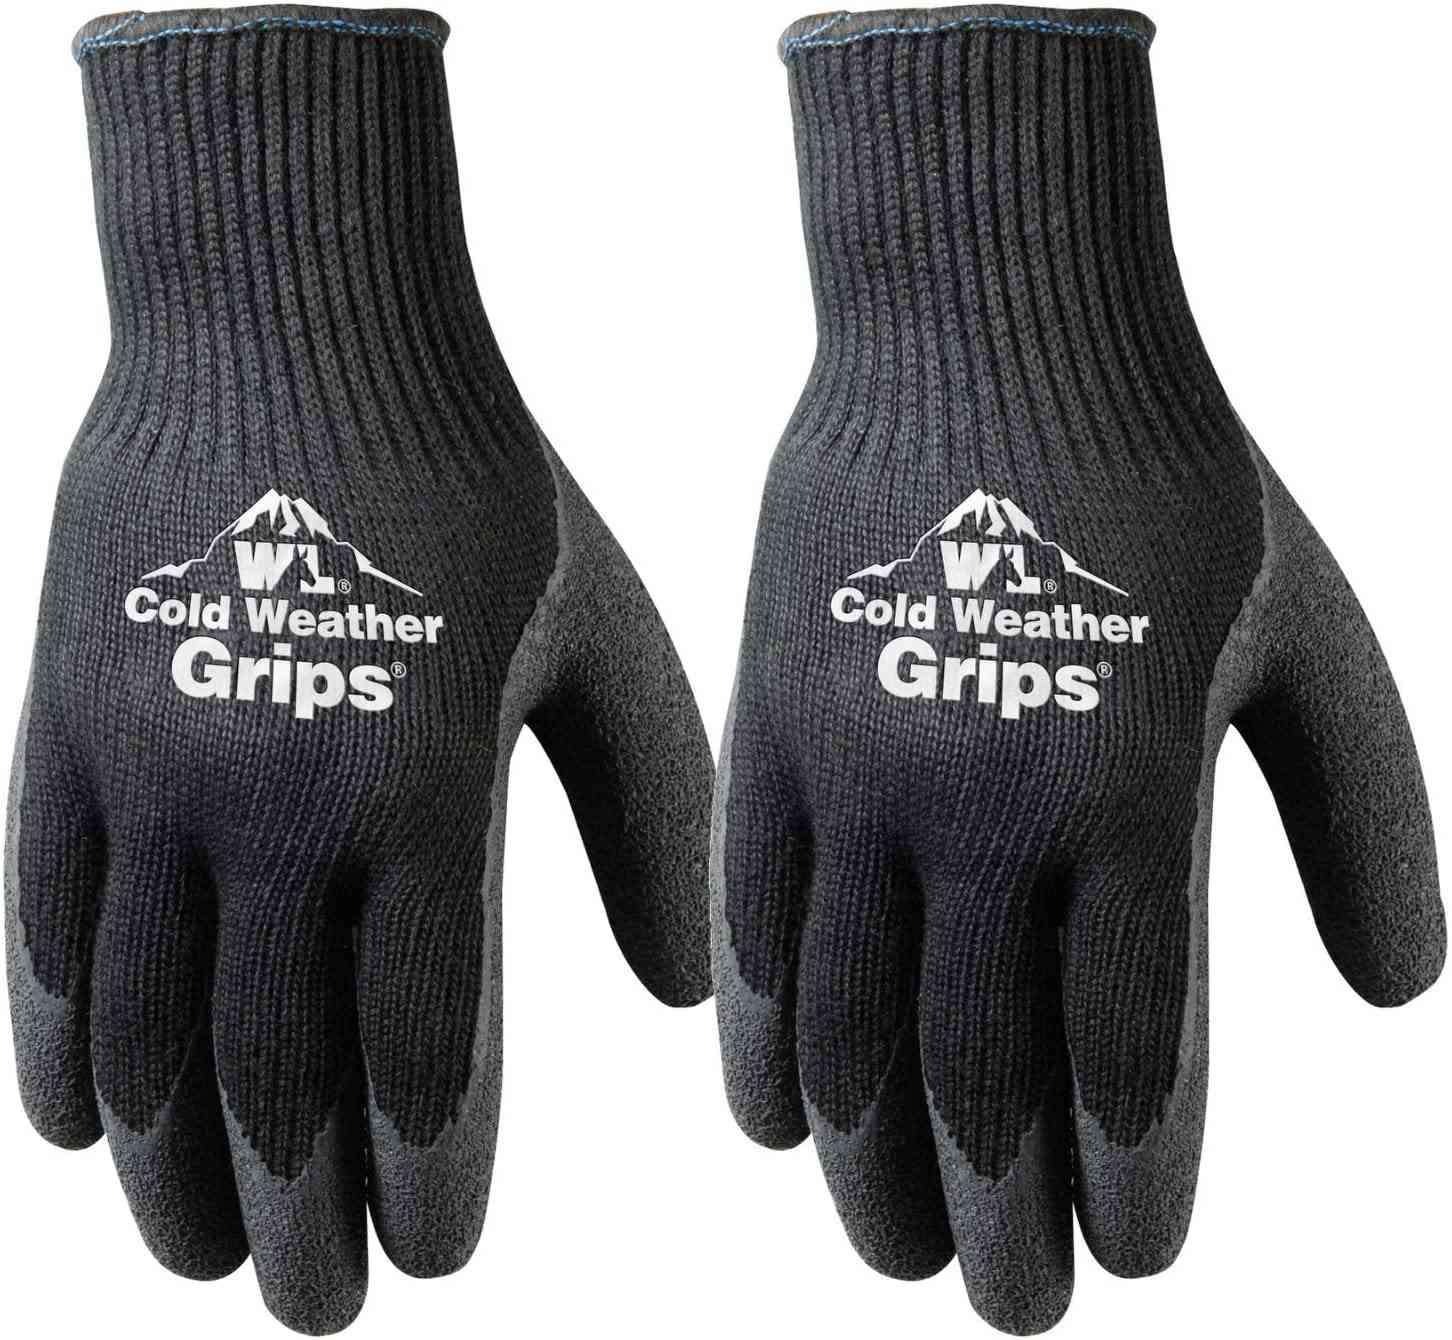 Cold Weather Grips Winter Work Glove